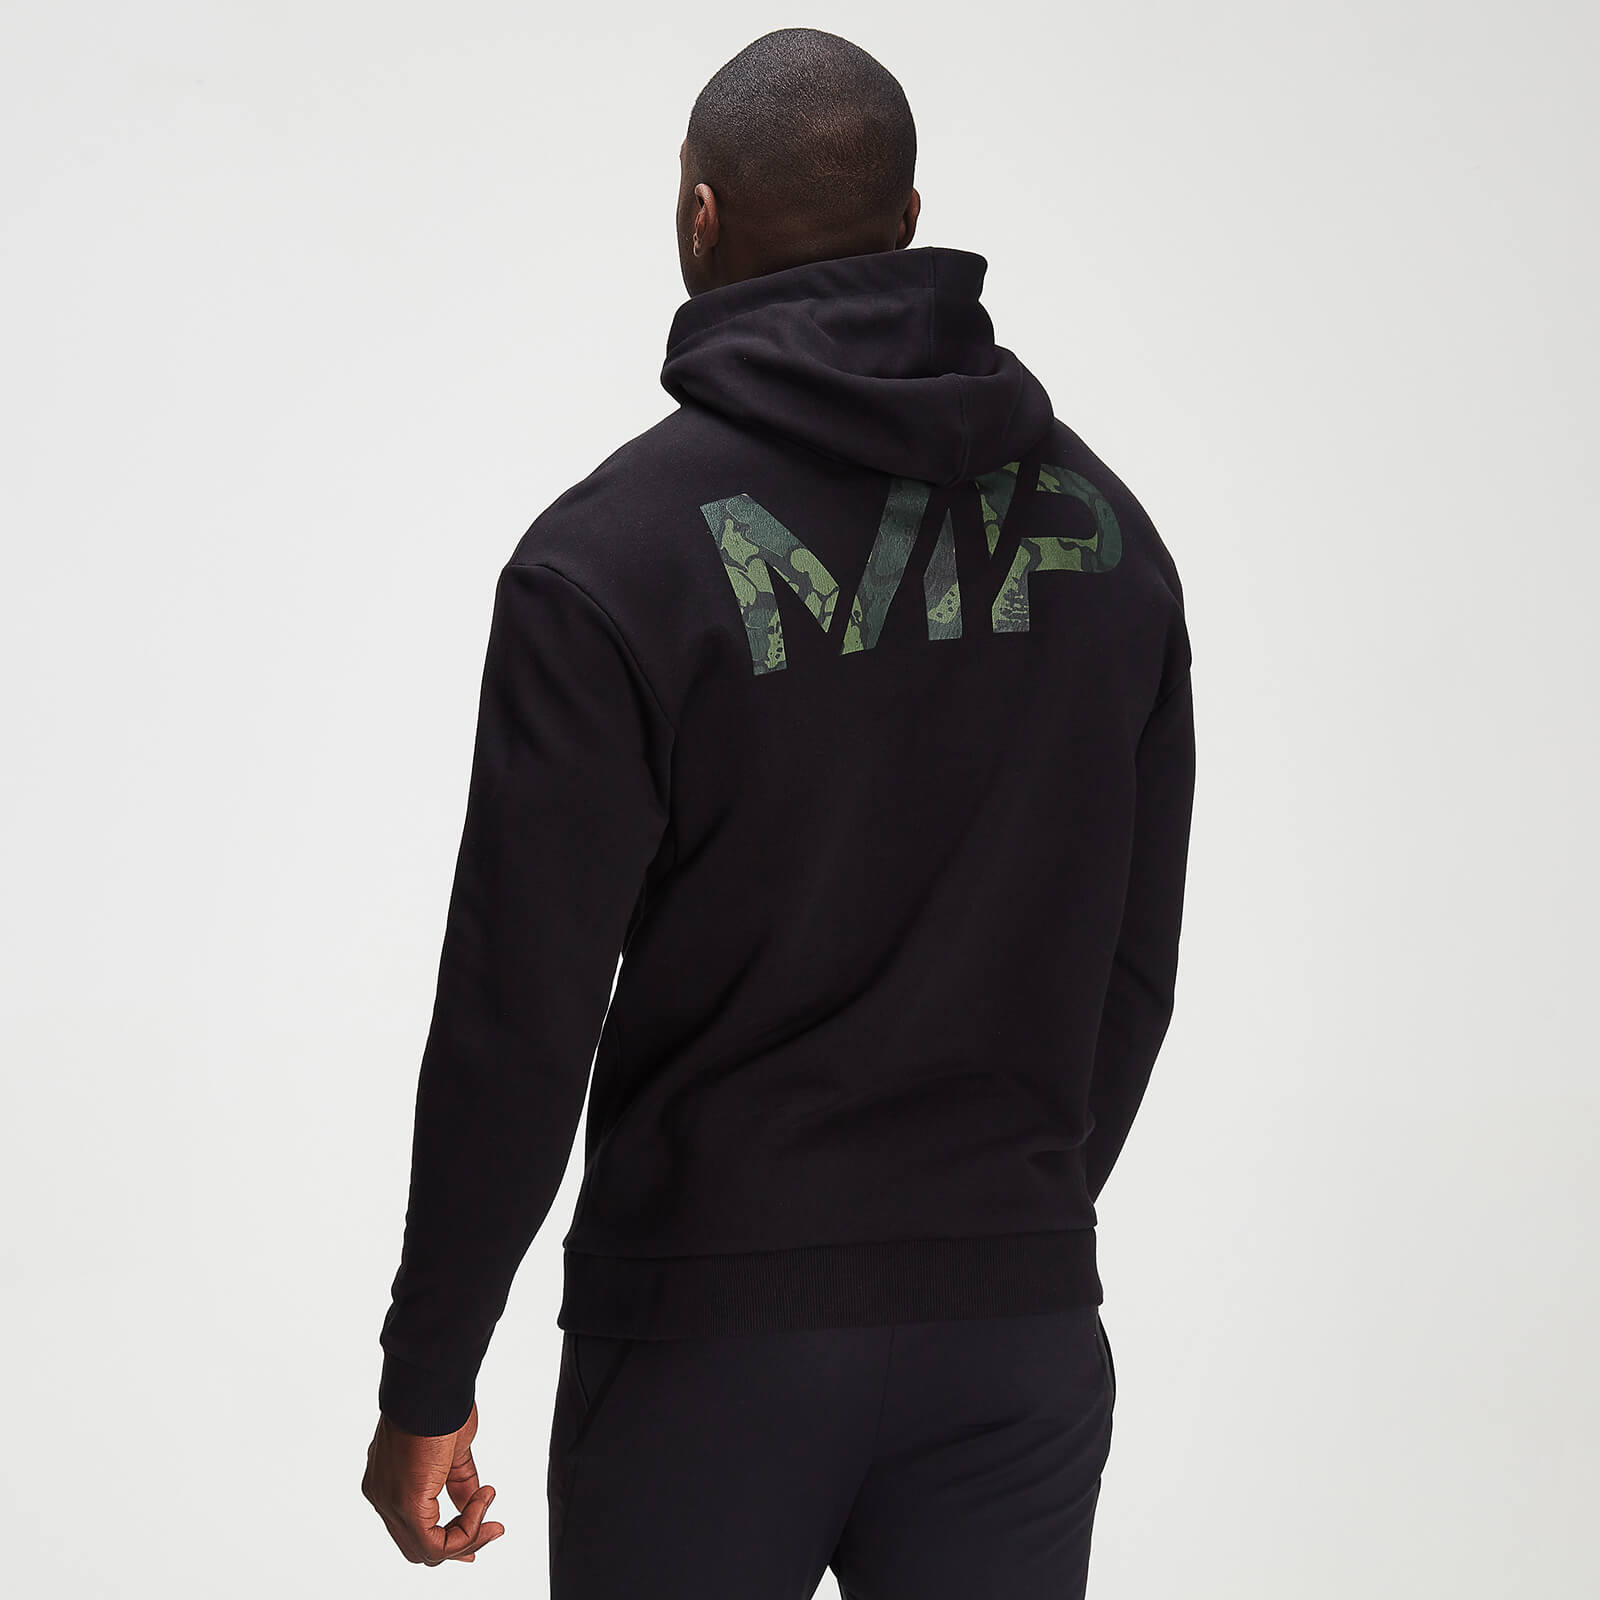 mp men's adapt washed black camo print hoodie- black - xs